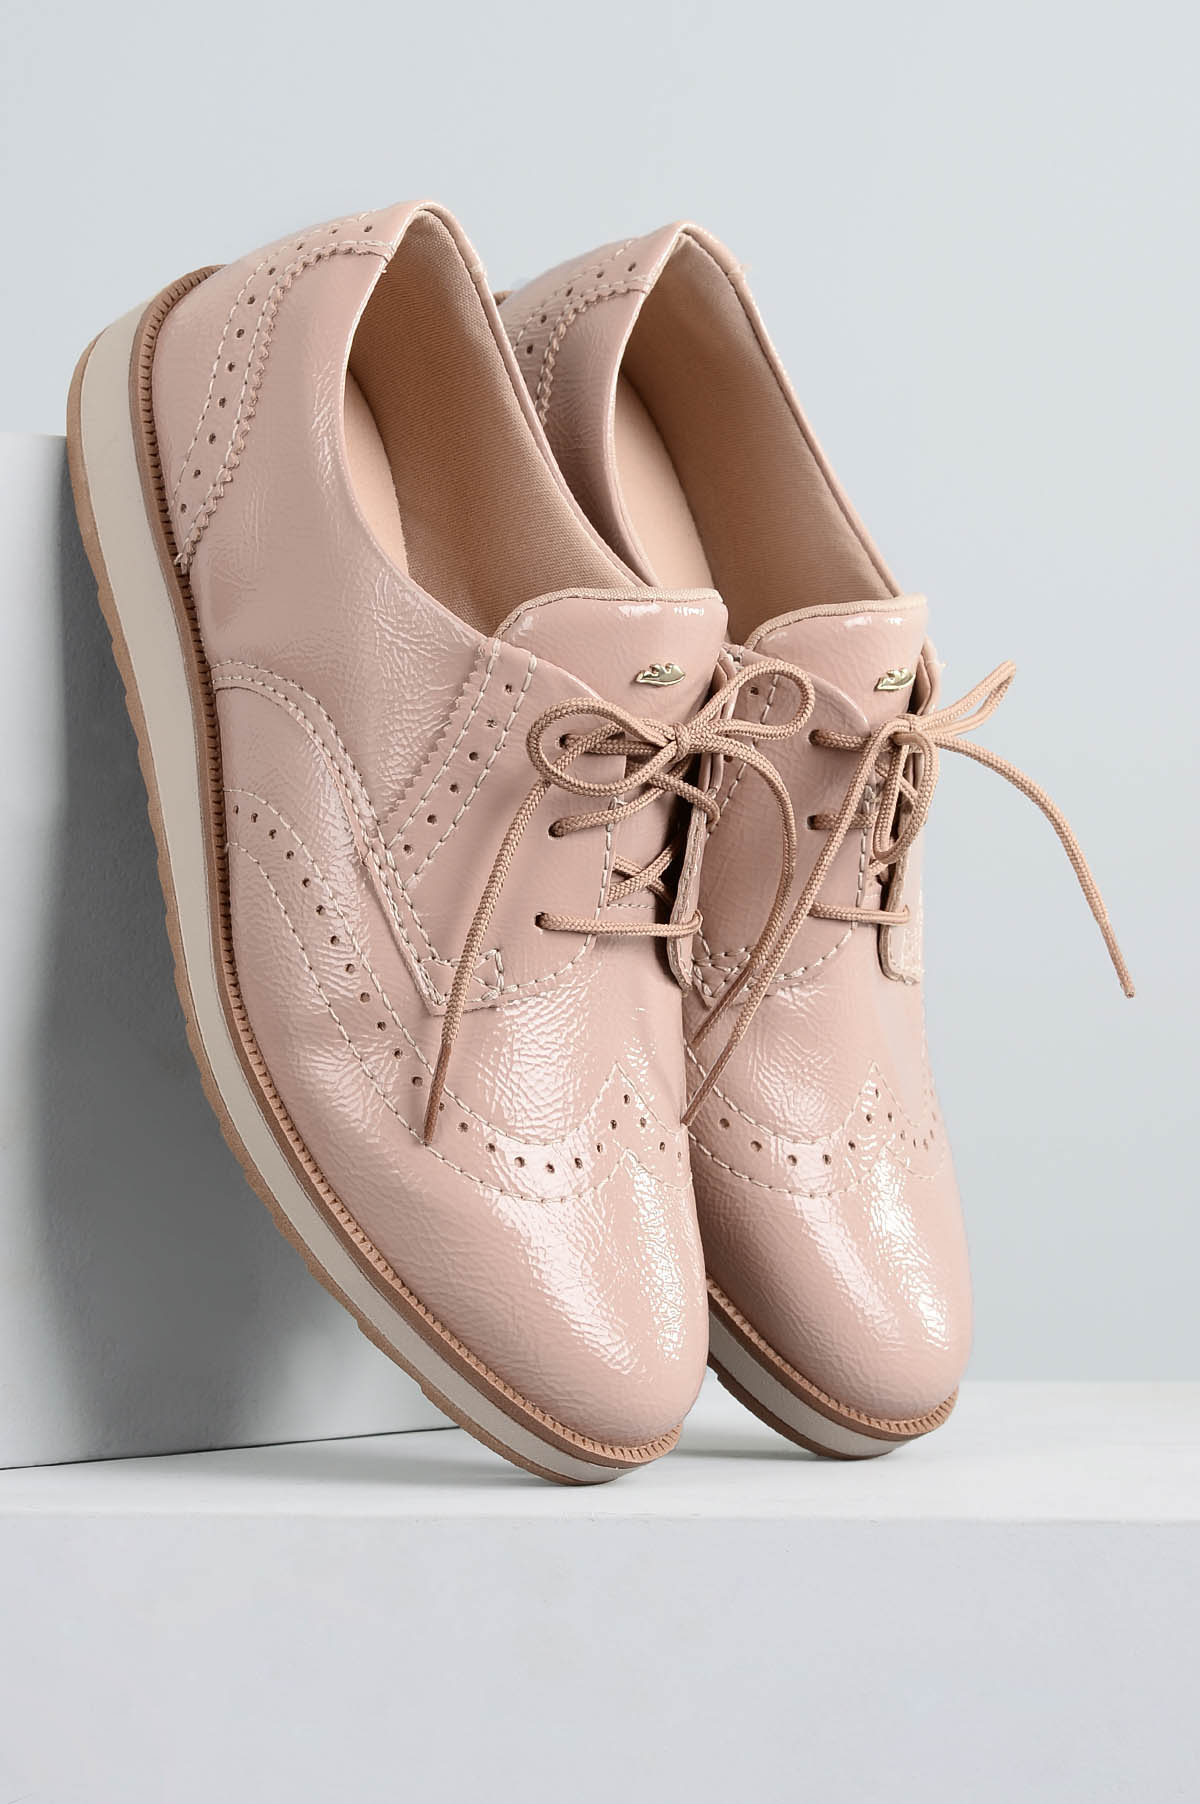 21b24b1211 Oxford Feminino Dilan Dakota VERNIZ - NUDE - Mundial Calçados